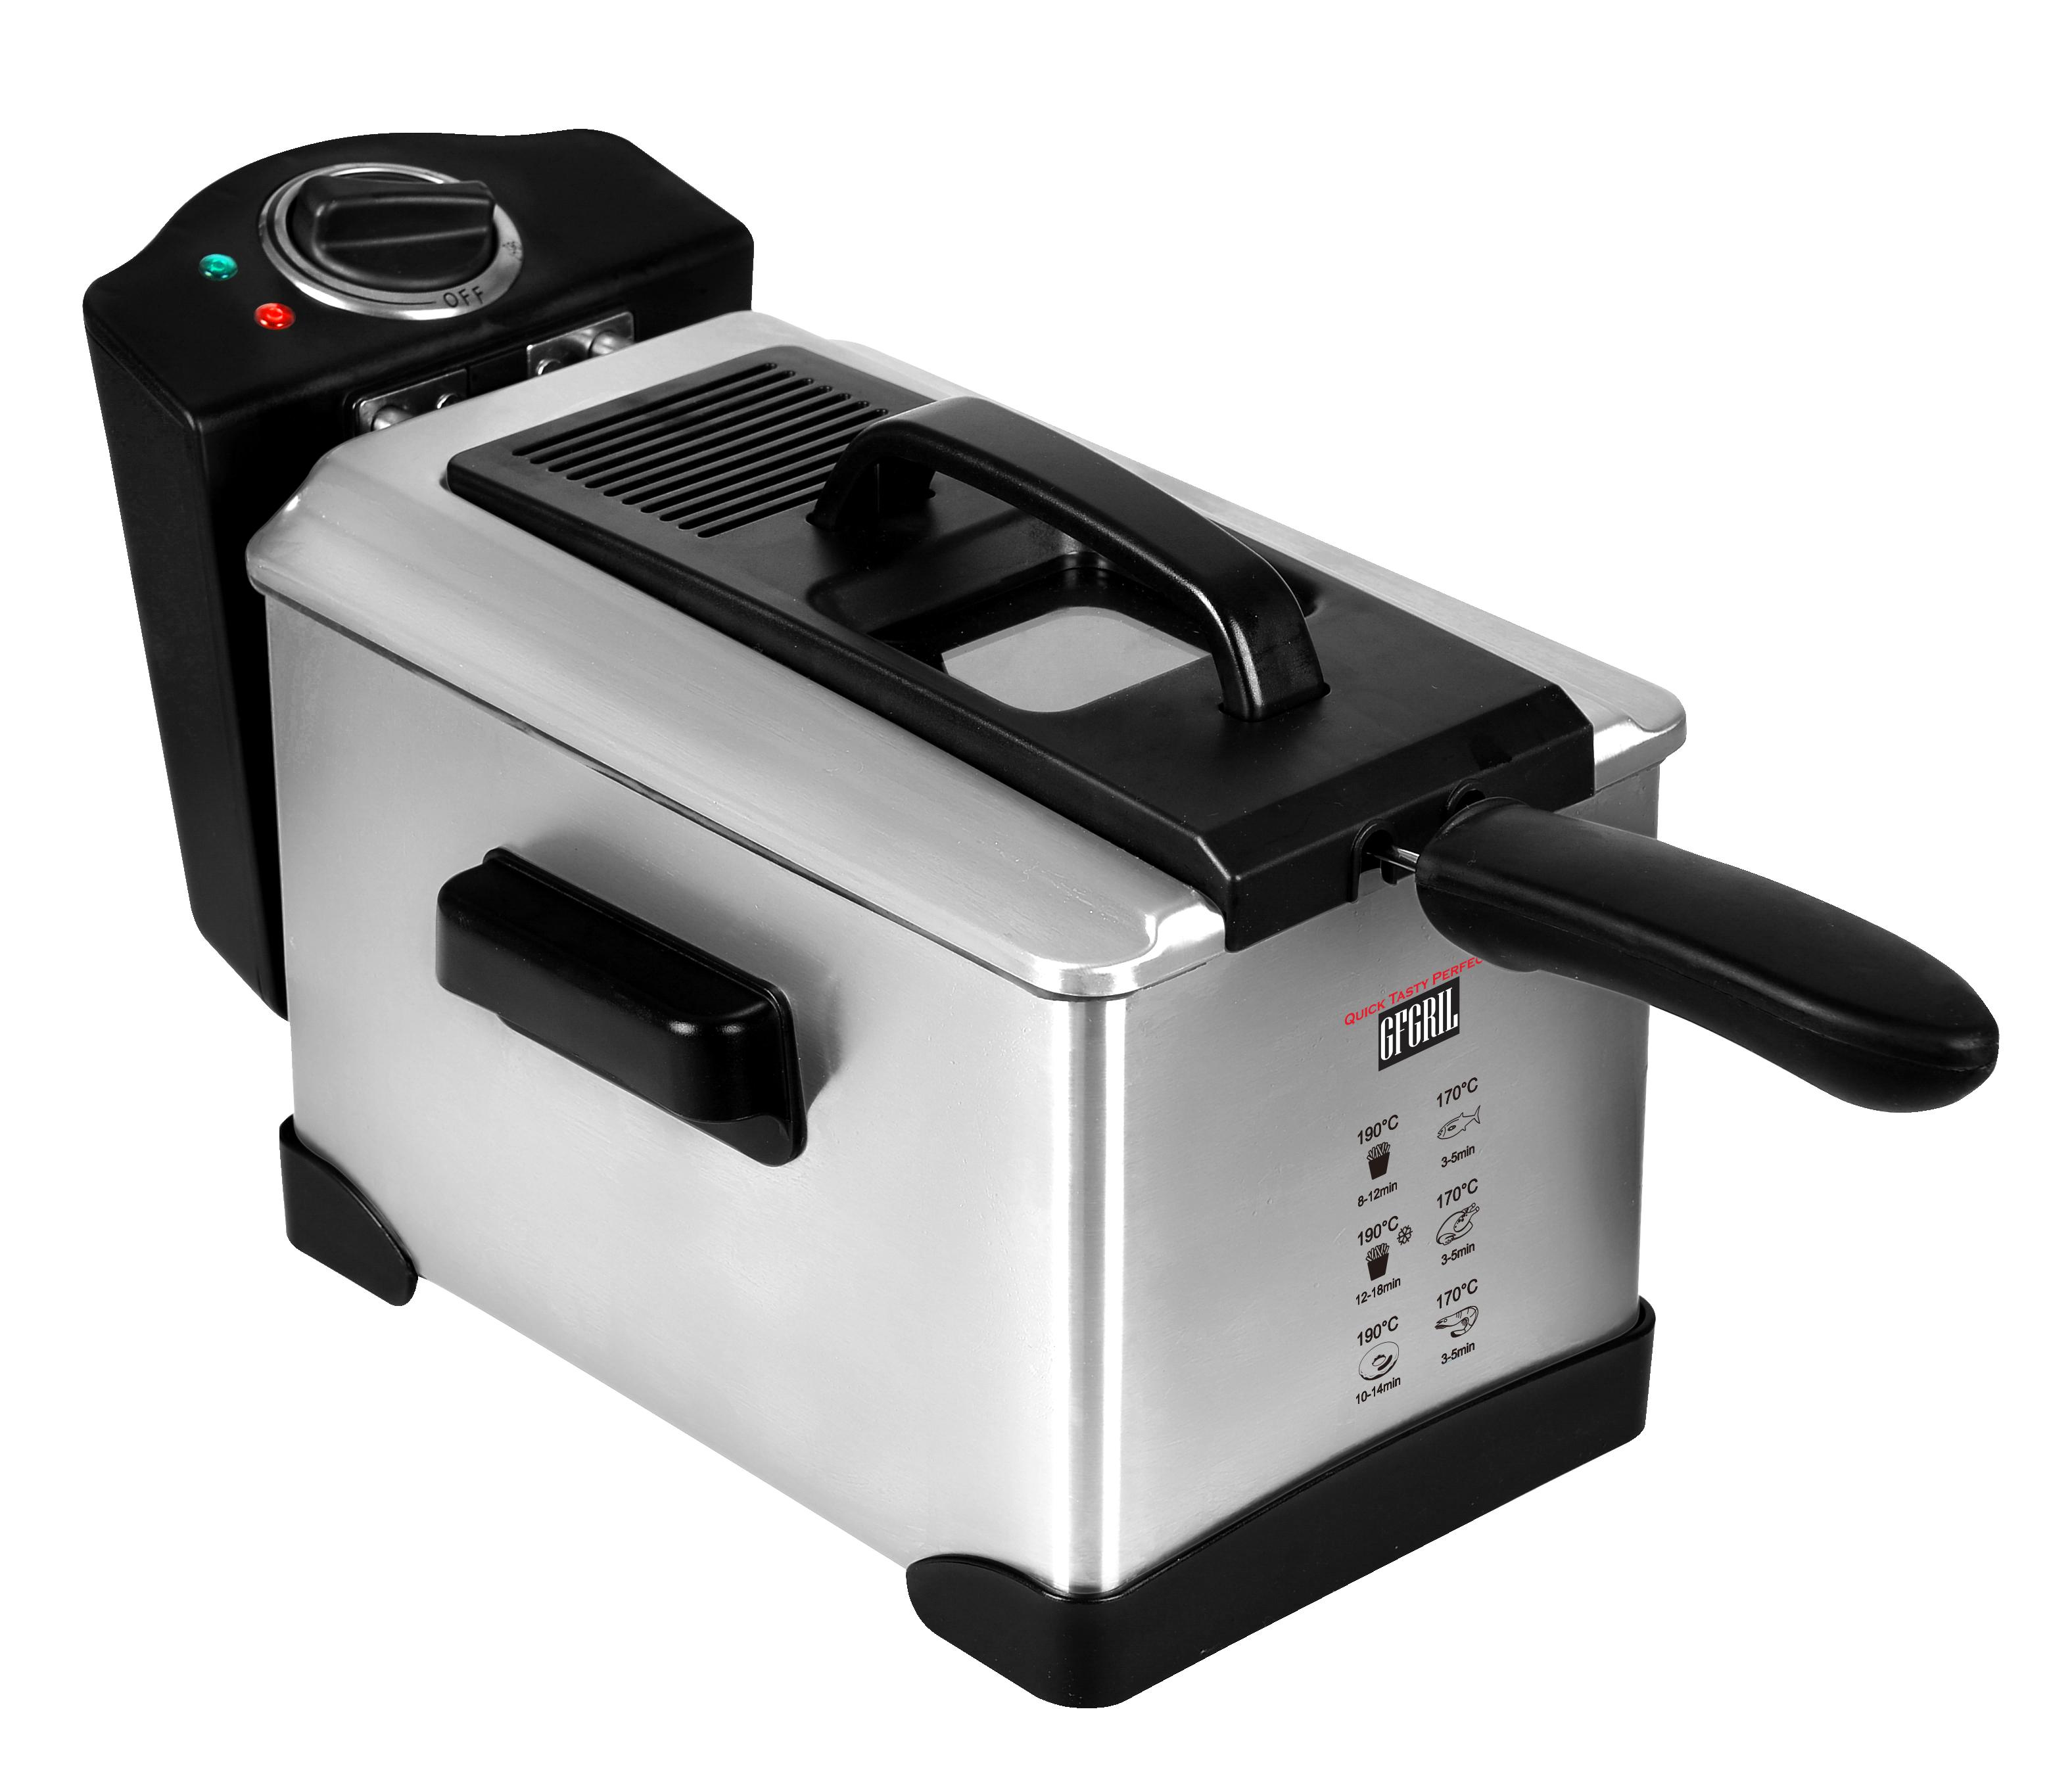 Фритюрница GFgril GFF-M2500 MasterCook